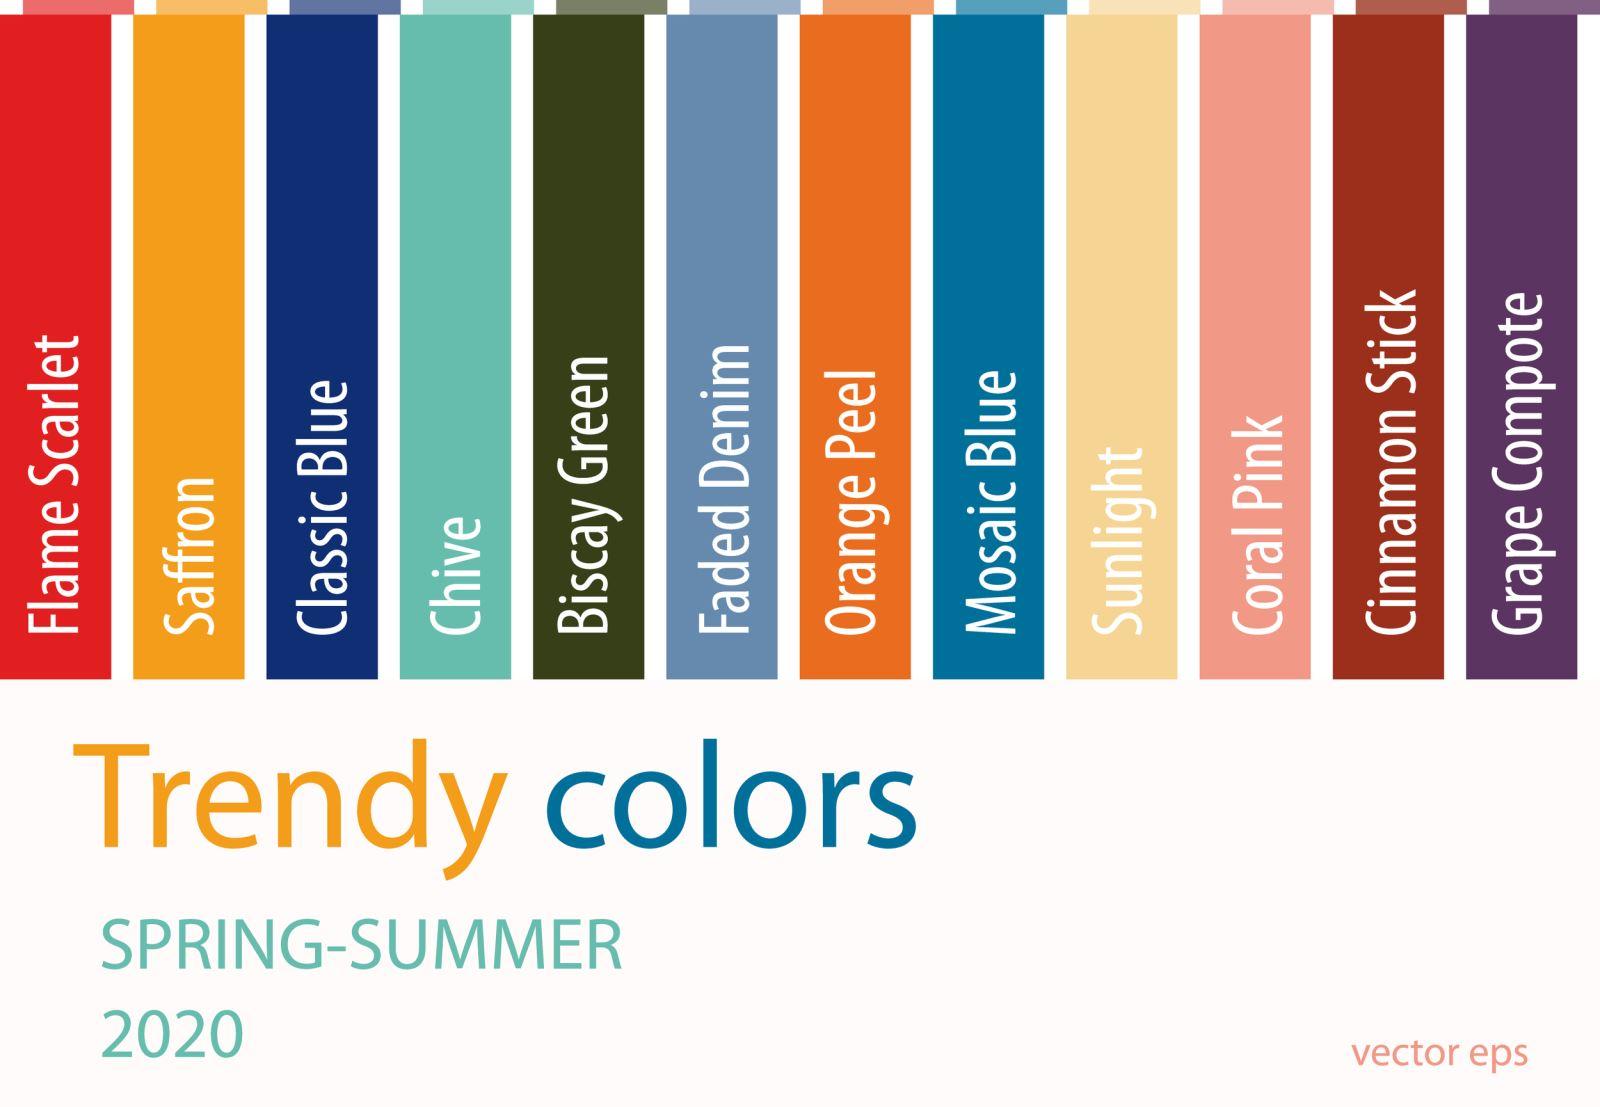 Colour trends chart